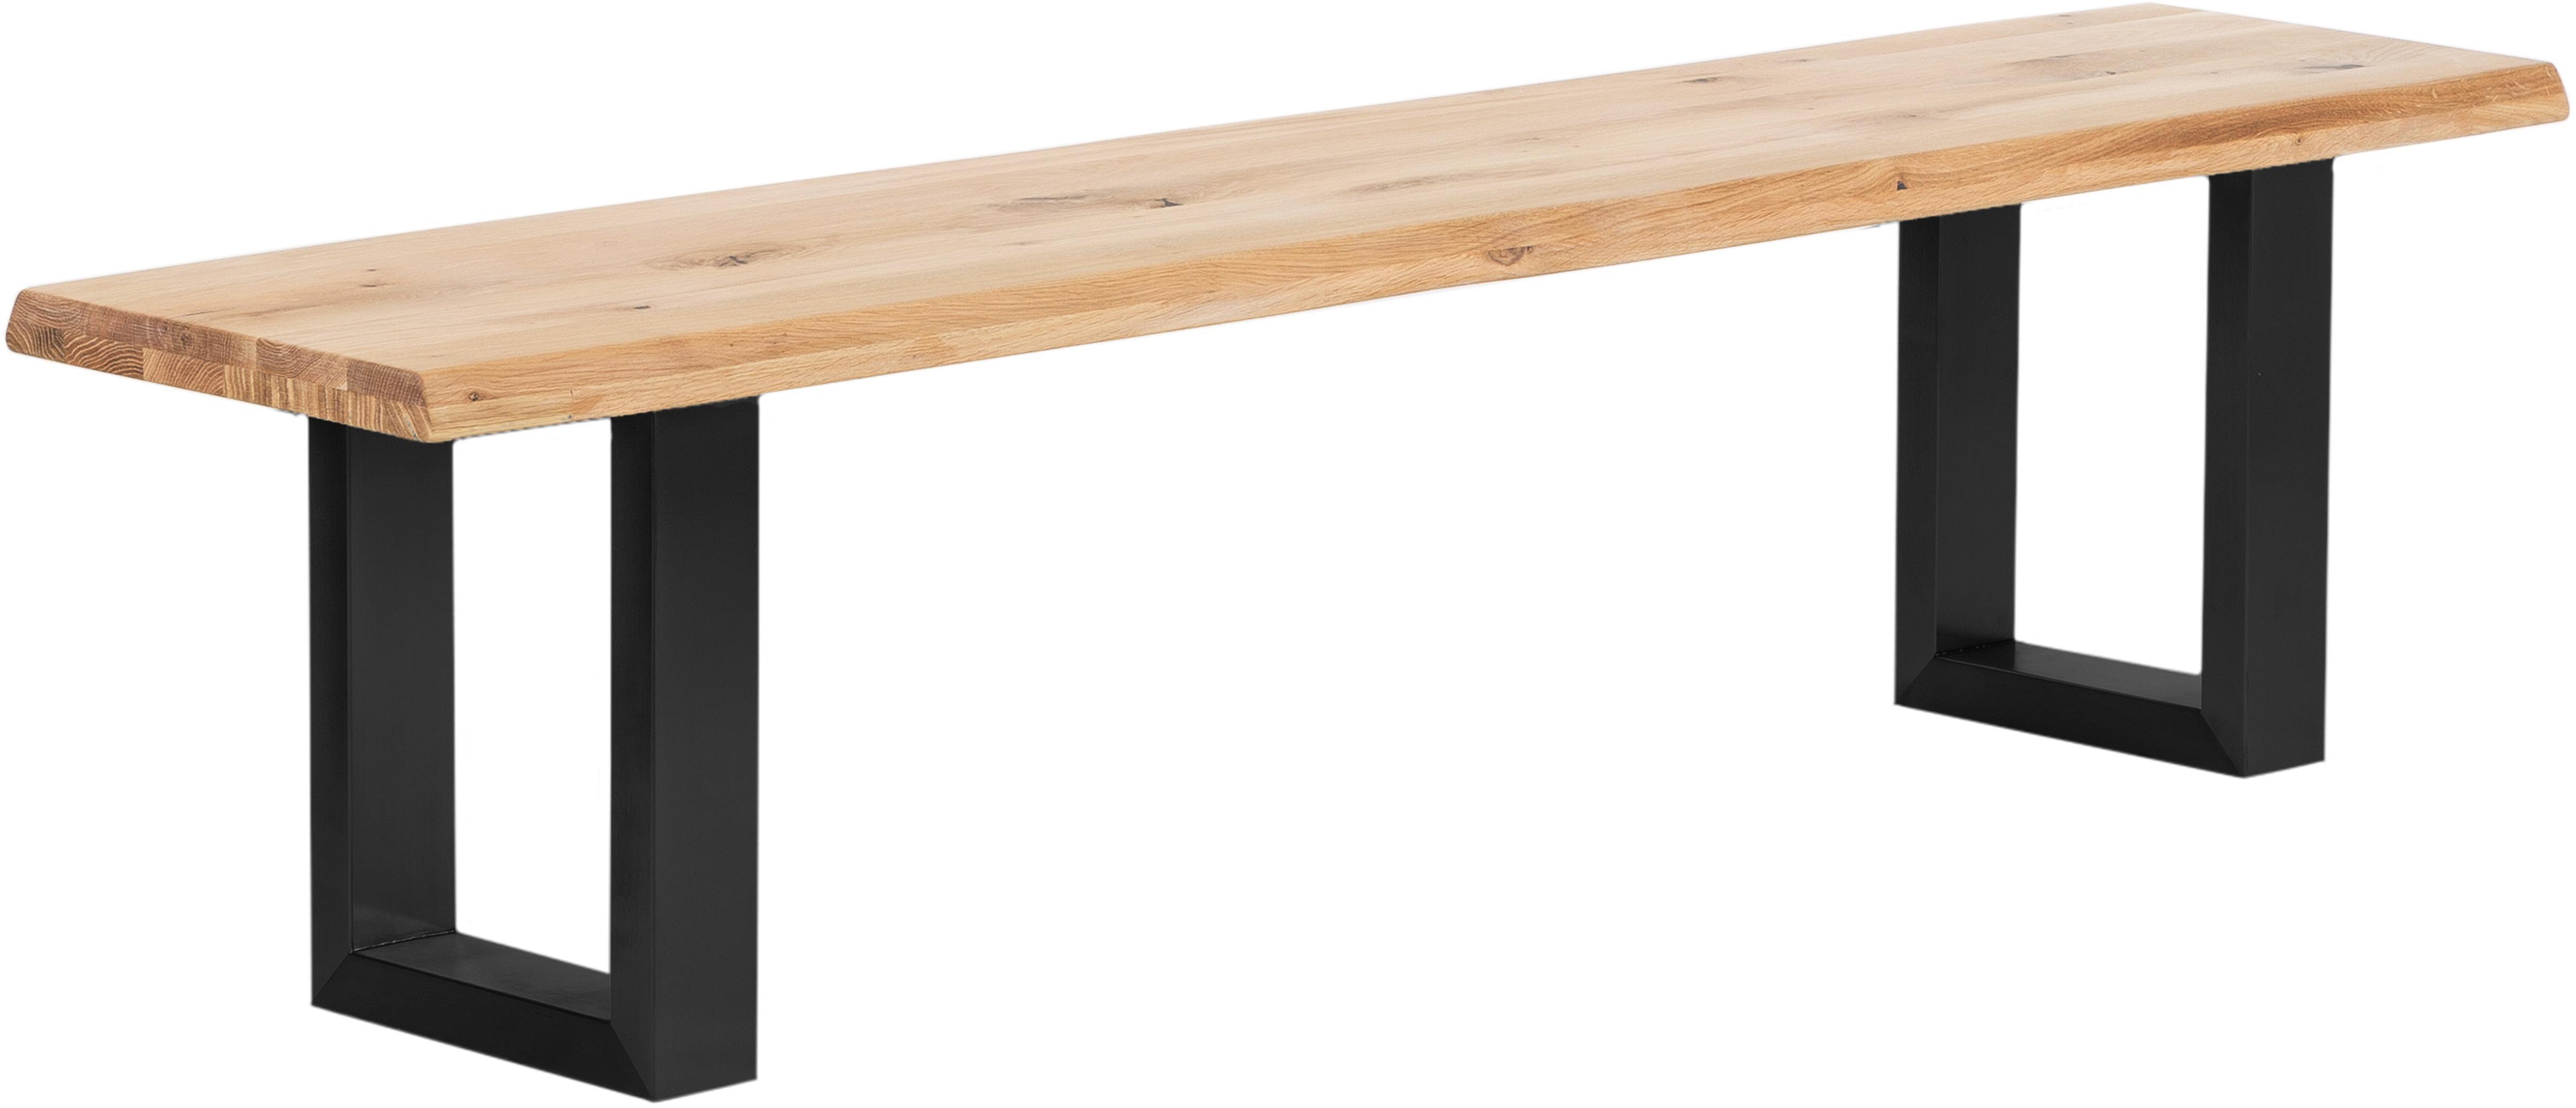 Panca in legno di quercia Oliver, Seduta: Quercia selvatica europea, Gambe: acciaio laccato opaco Il , Seduta: quercia selvatica, gambe: nero opaco, Larg. 180 x Alt. 45 cm